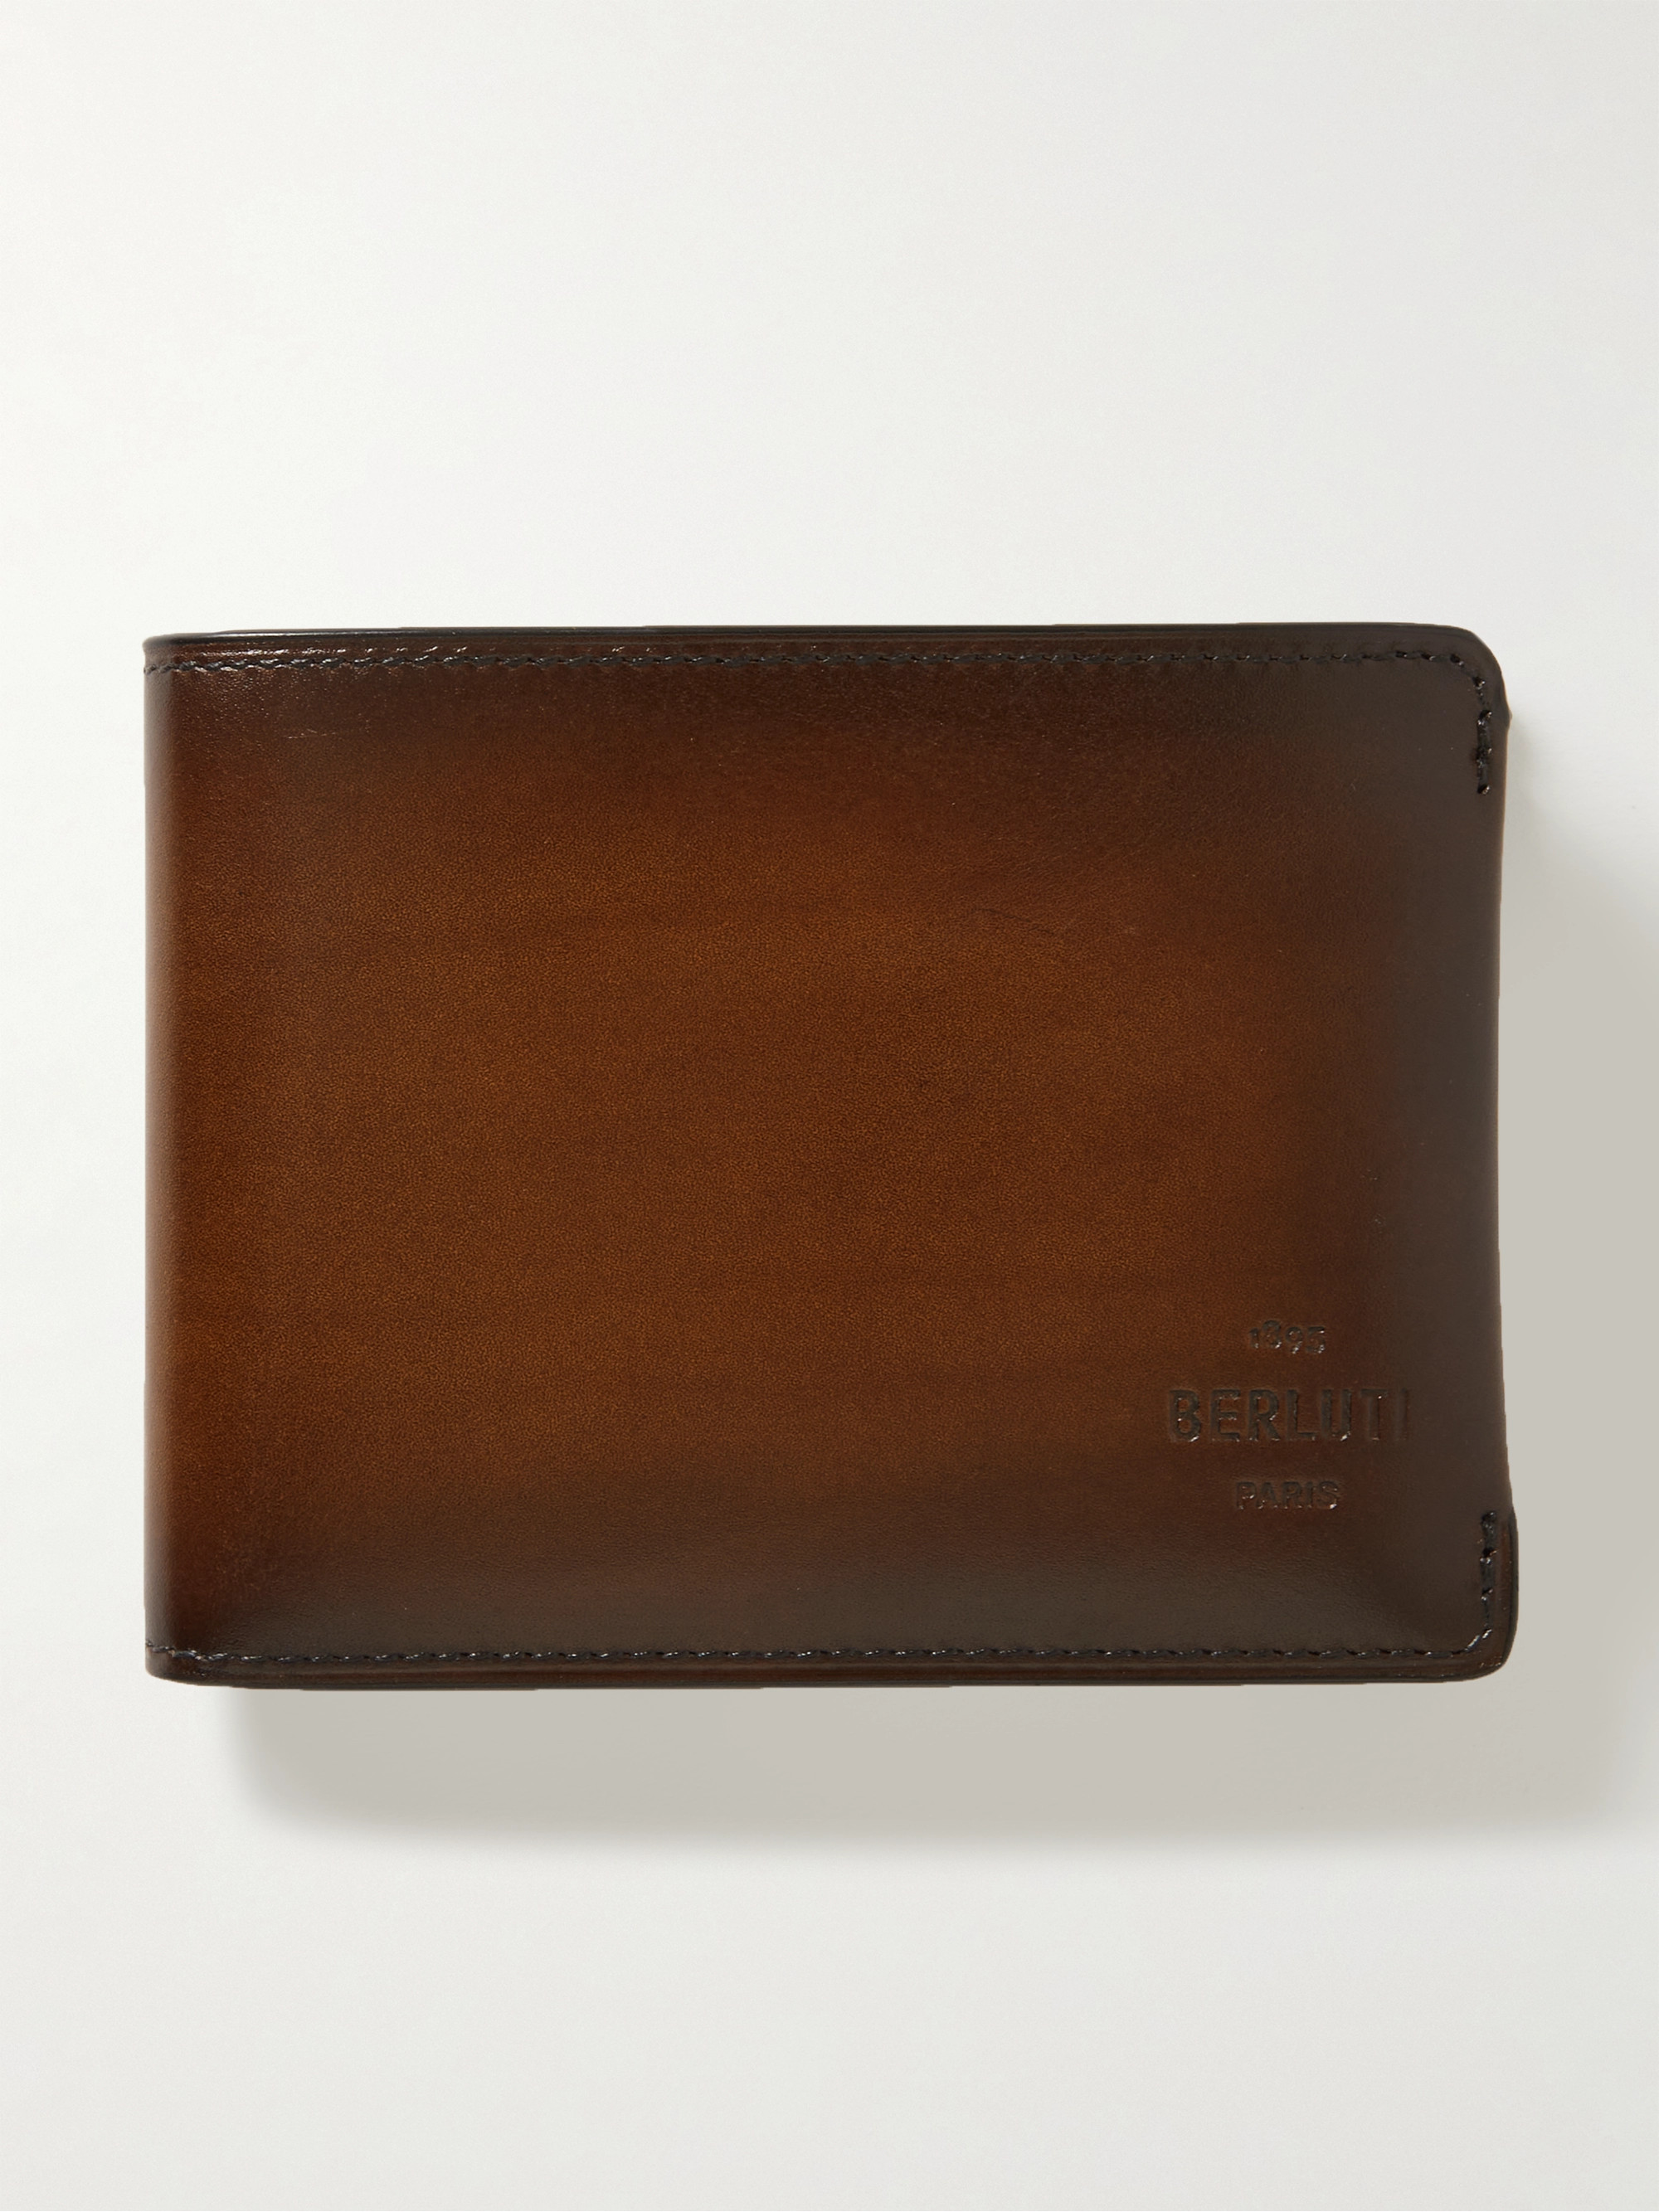 23aac8a0 Wallets for Men | Designer Accessories | MR PORTER